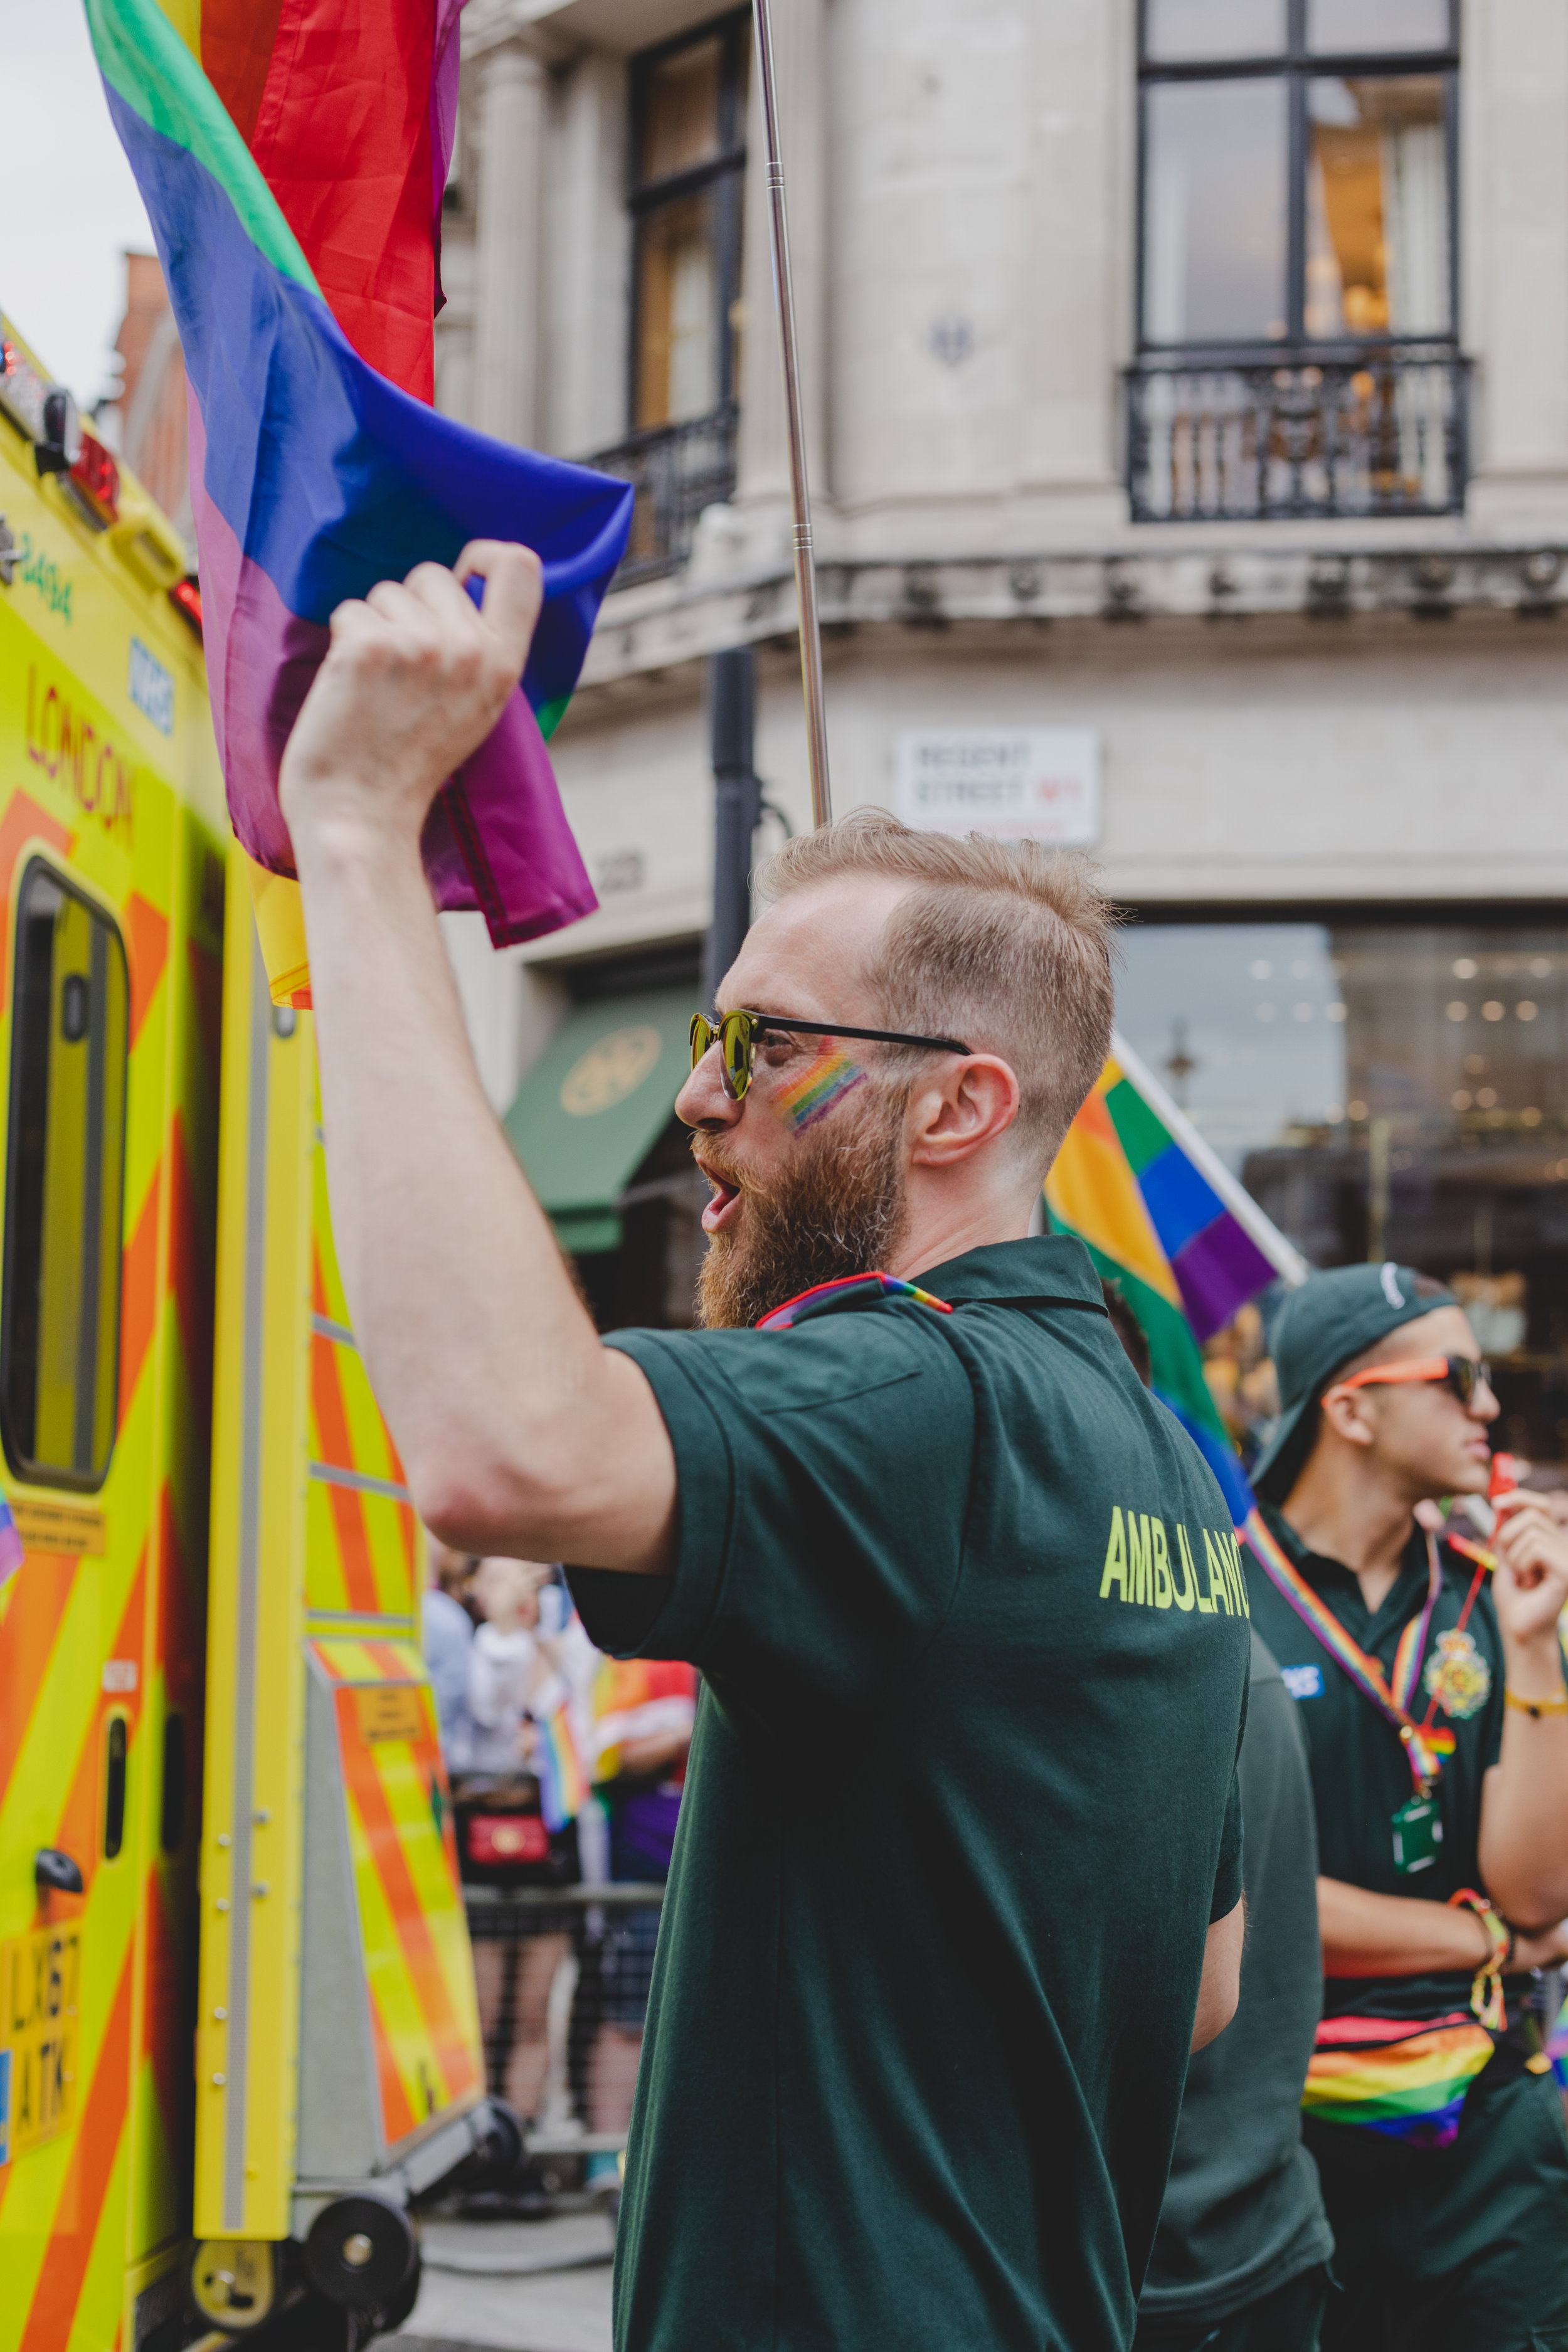 Pride in London 2019 - St John's Ambulance Service